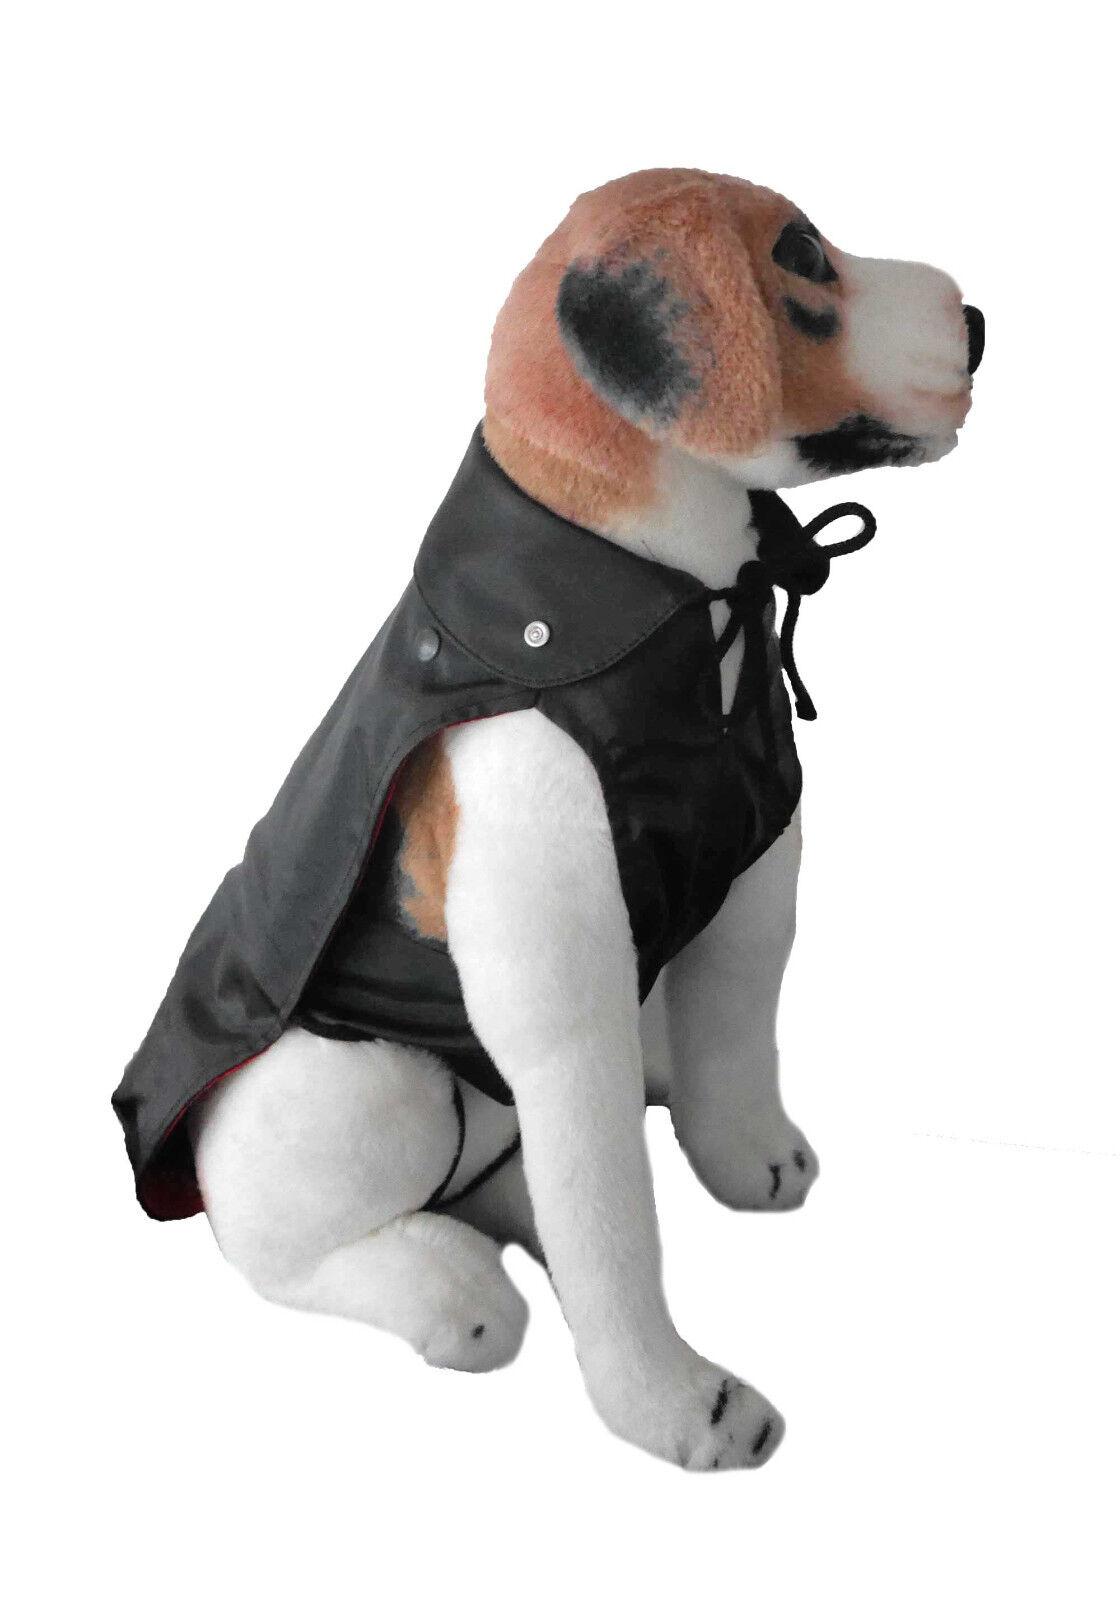 Hunde Regenmantel 2 in1 NässeKälteschutz abnehmbares Innenfutter Sommer-Winter   | Komfort